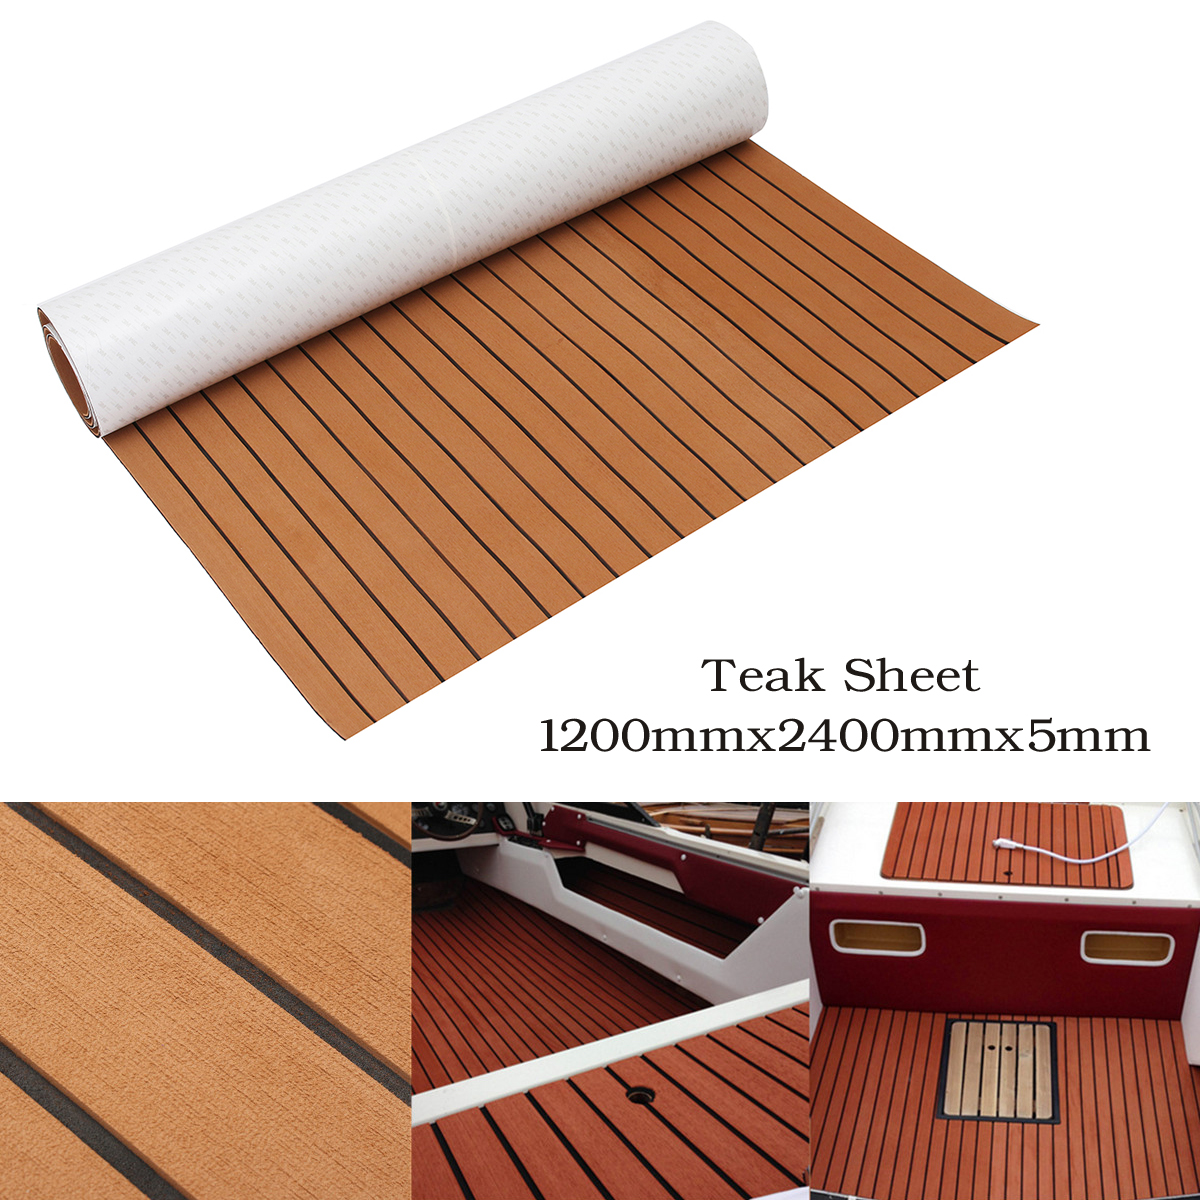 1200mmx2400mmx5mm Self Adhesive EVA Foam Faux Teak Sheet Boat Yacht Synthetic Teak Decking Floor Mat Brown